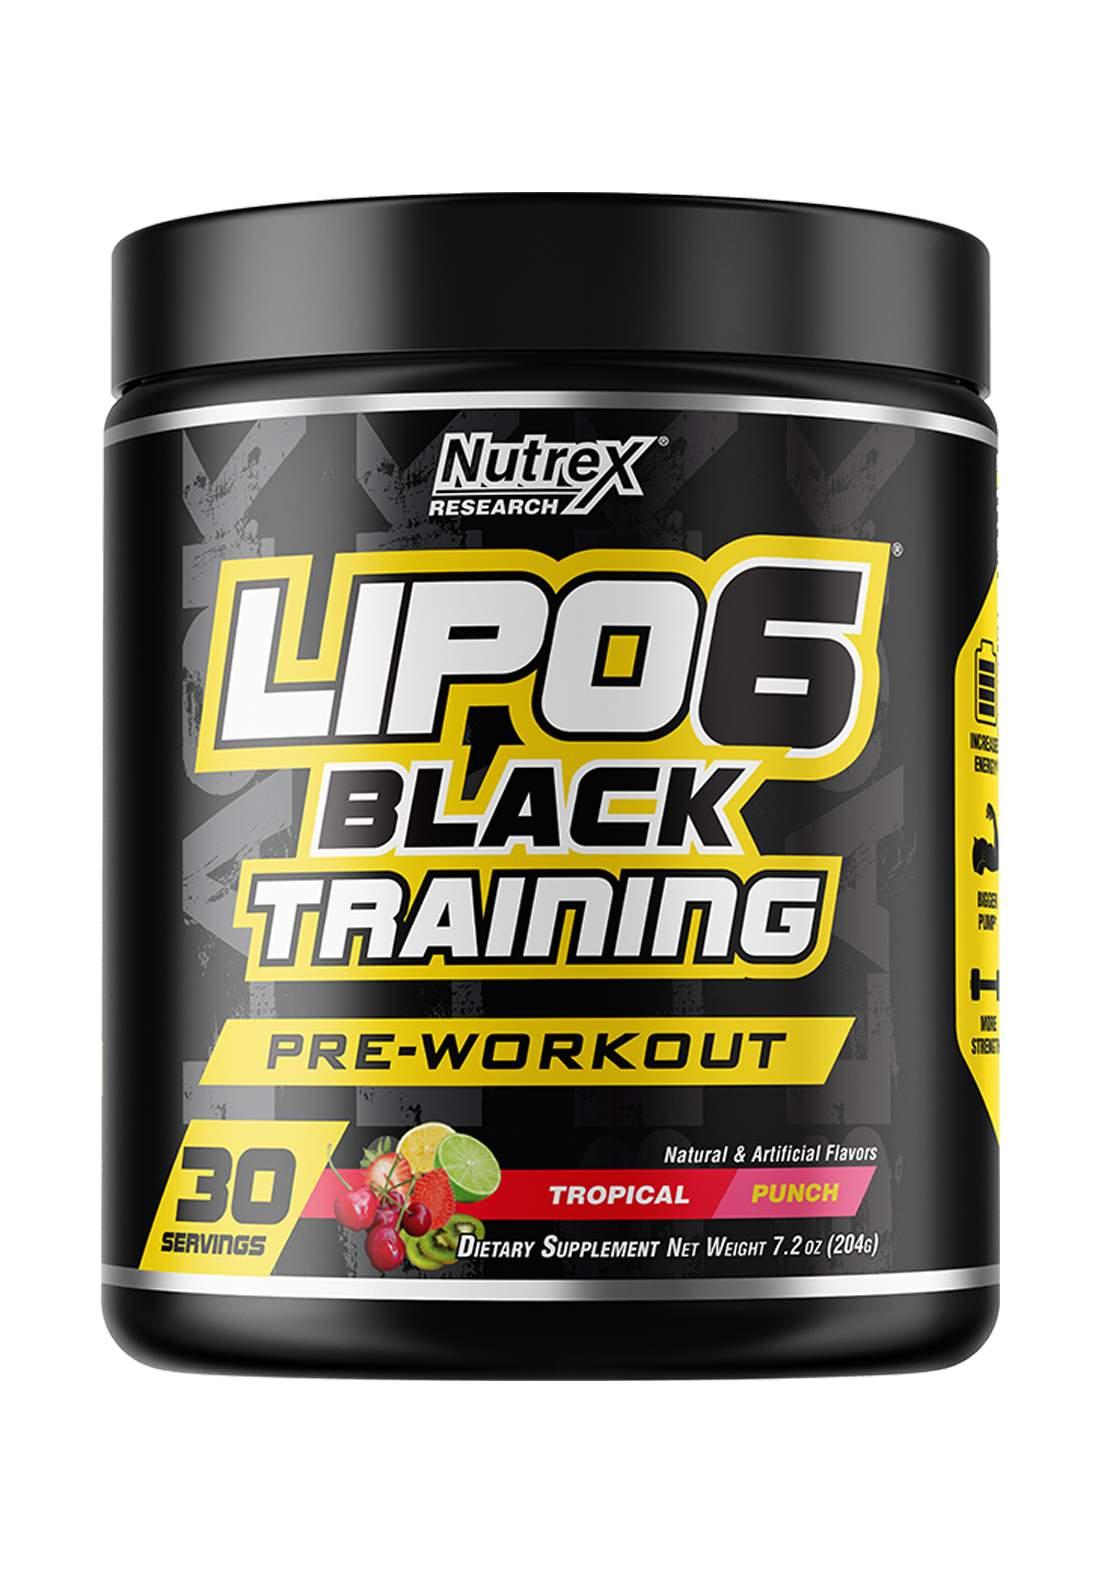 Lipo-6 Black Training Pre-Workout Tropical Punchمكمل غذائي لانقاص الوزن